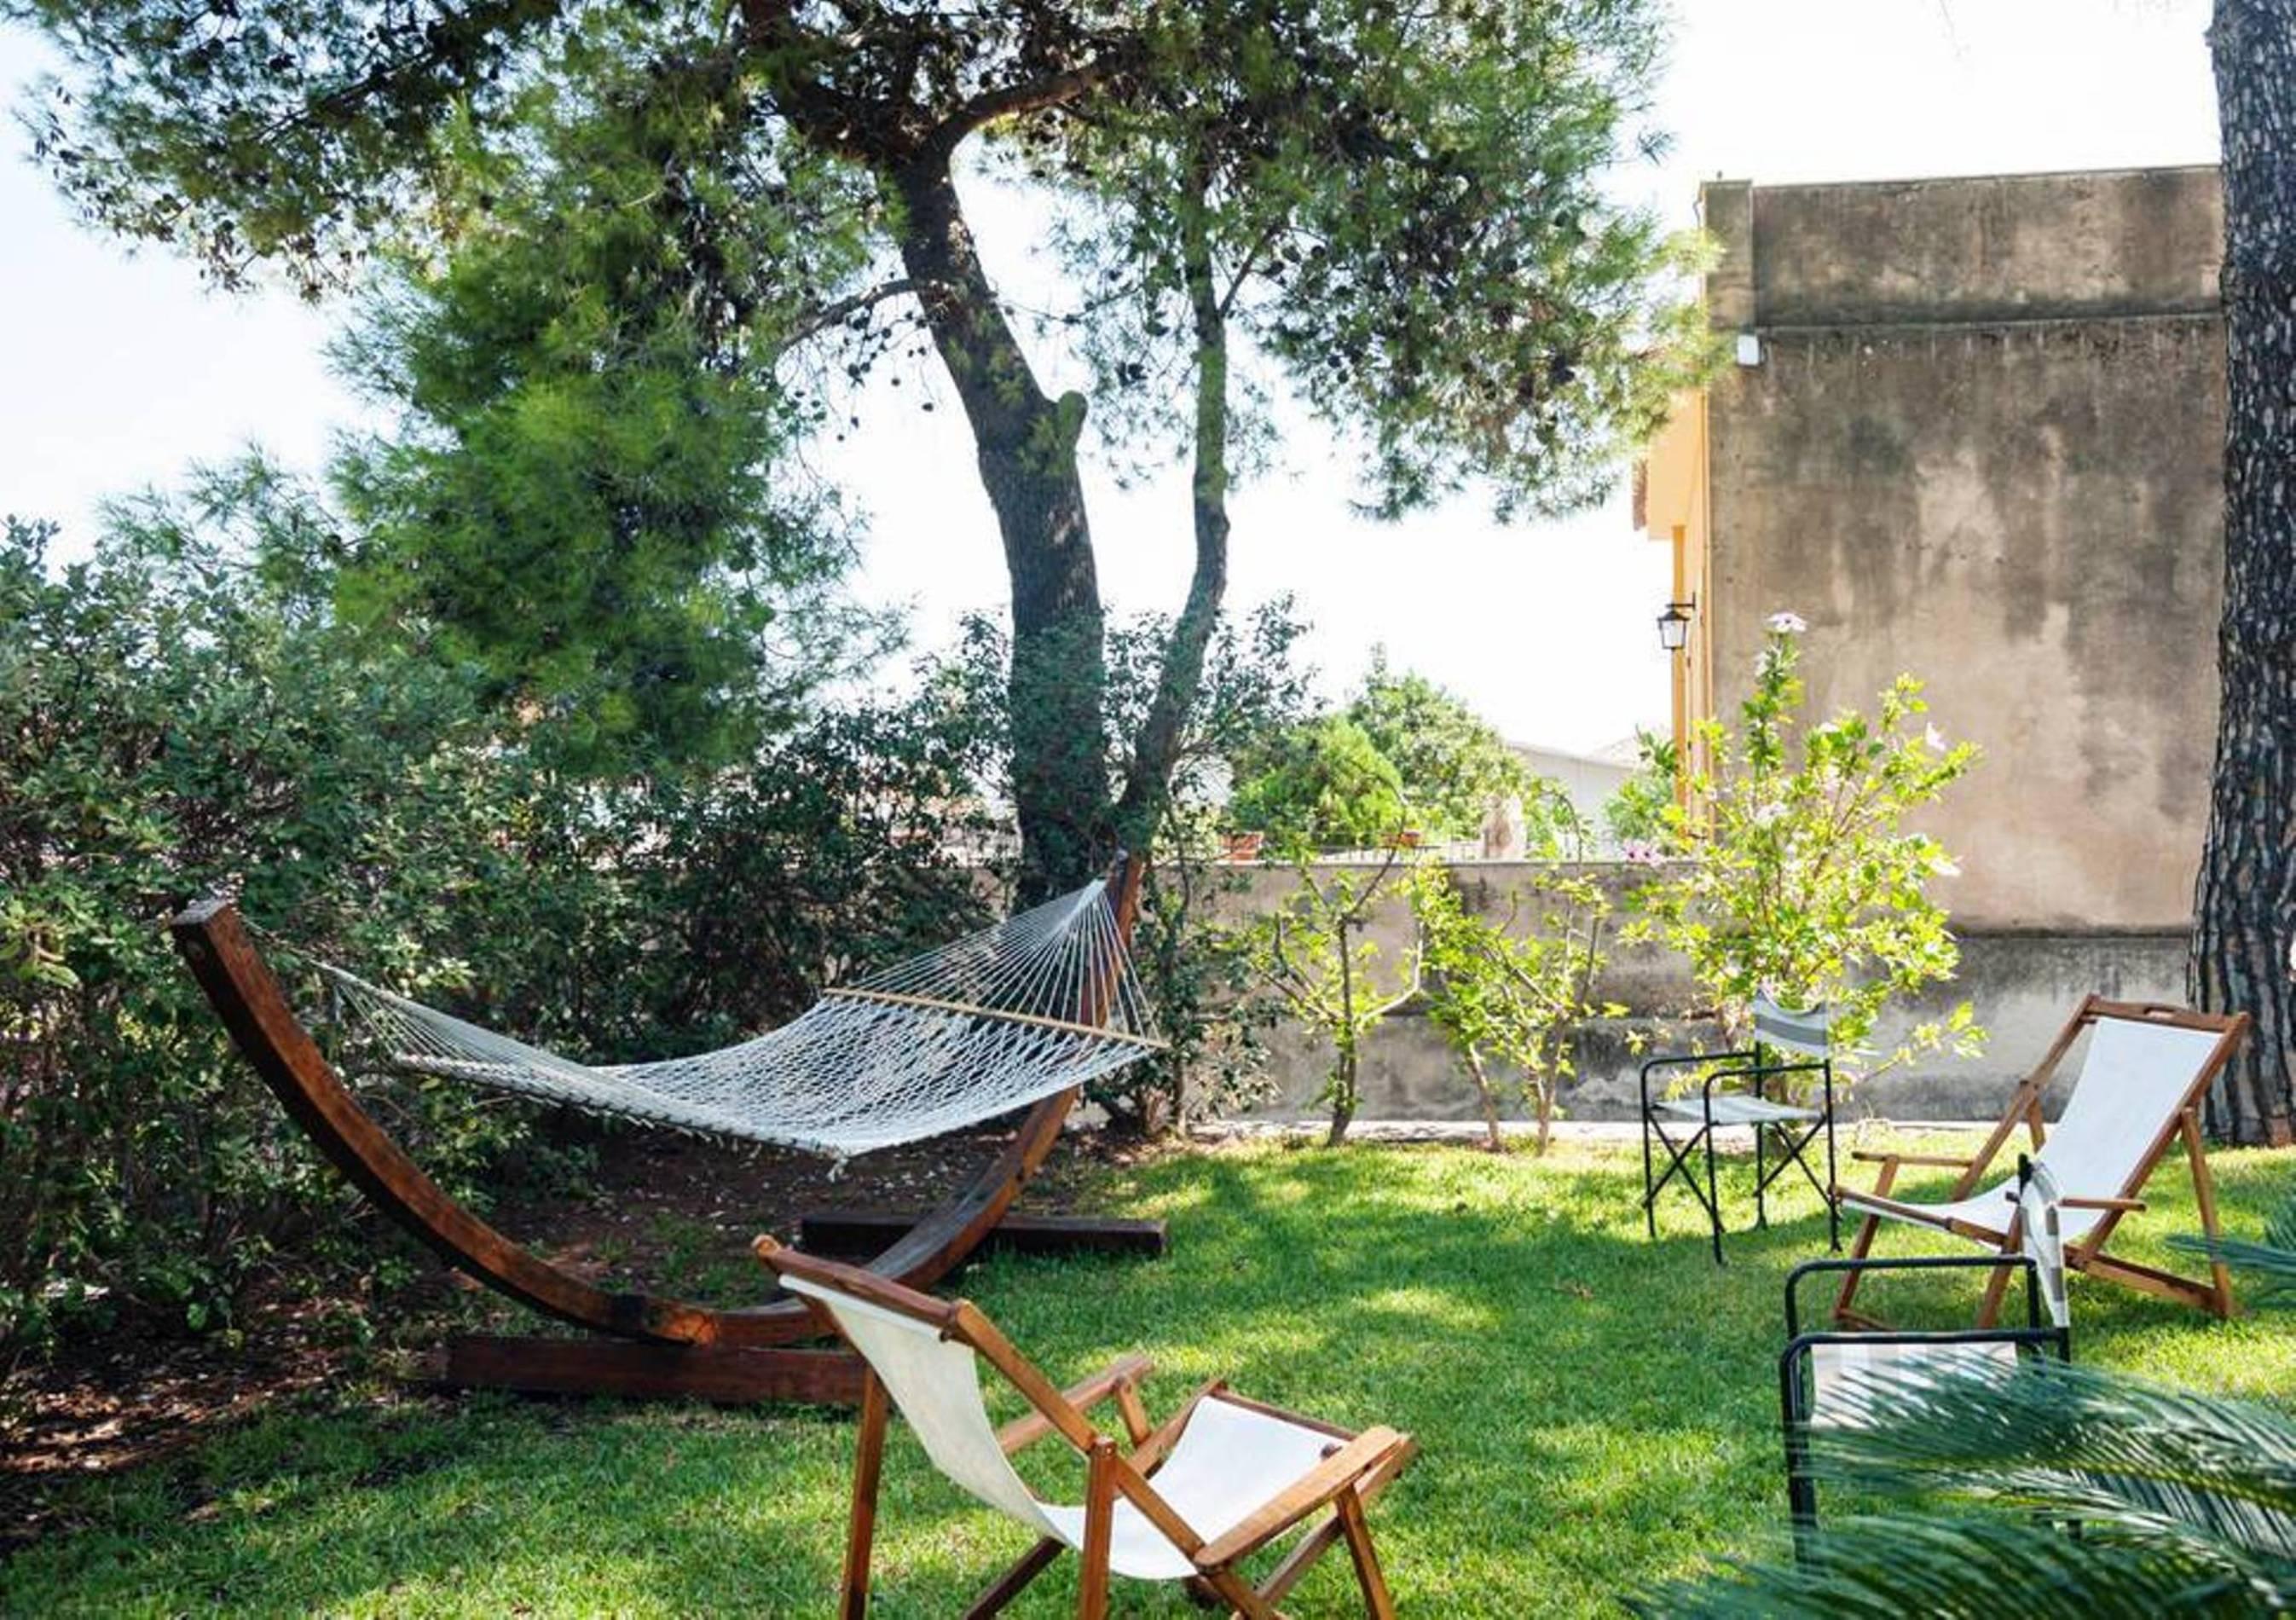 Apartment Villa with garden in Sicily near the sea   photo 18689398